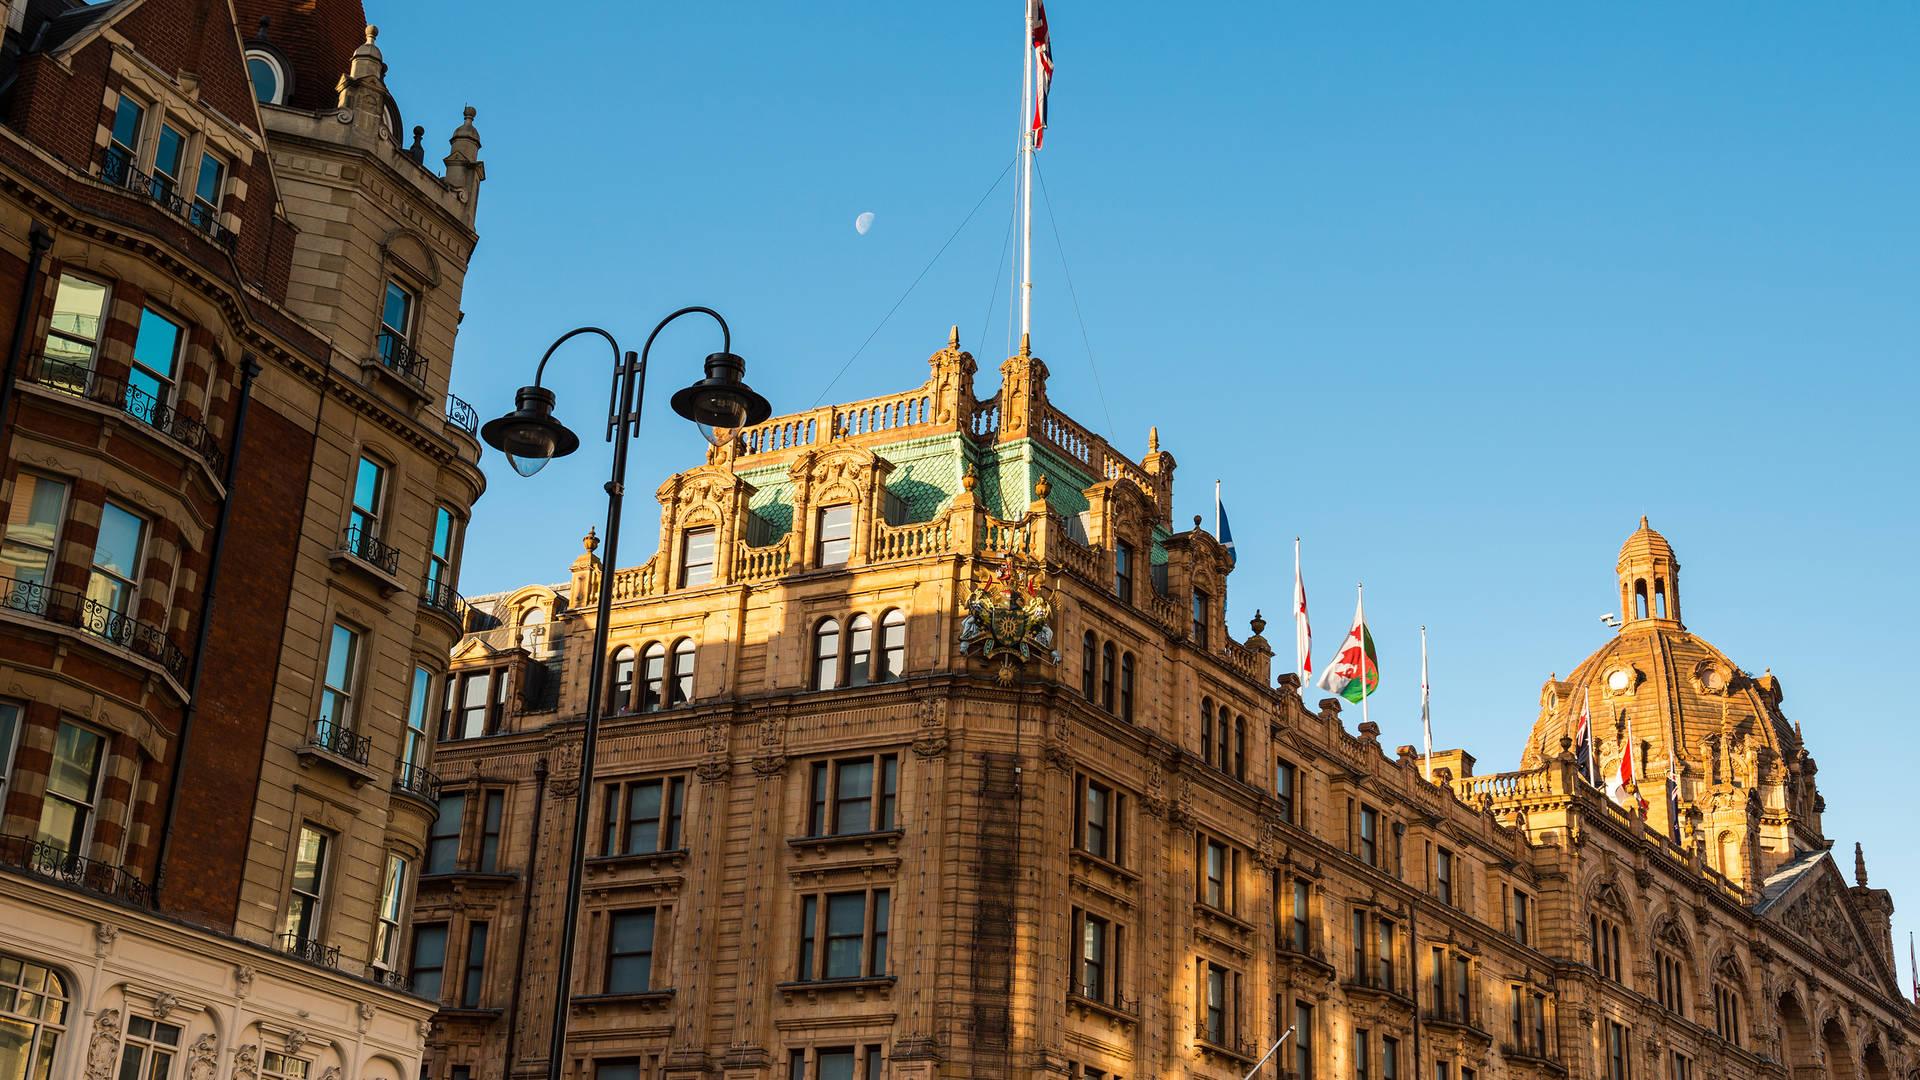 View of Harrods facade in London